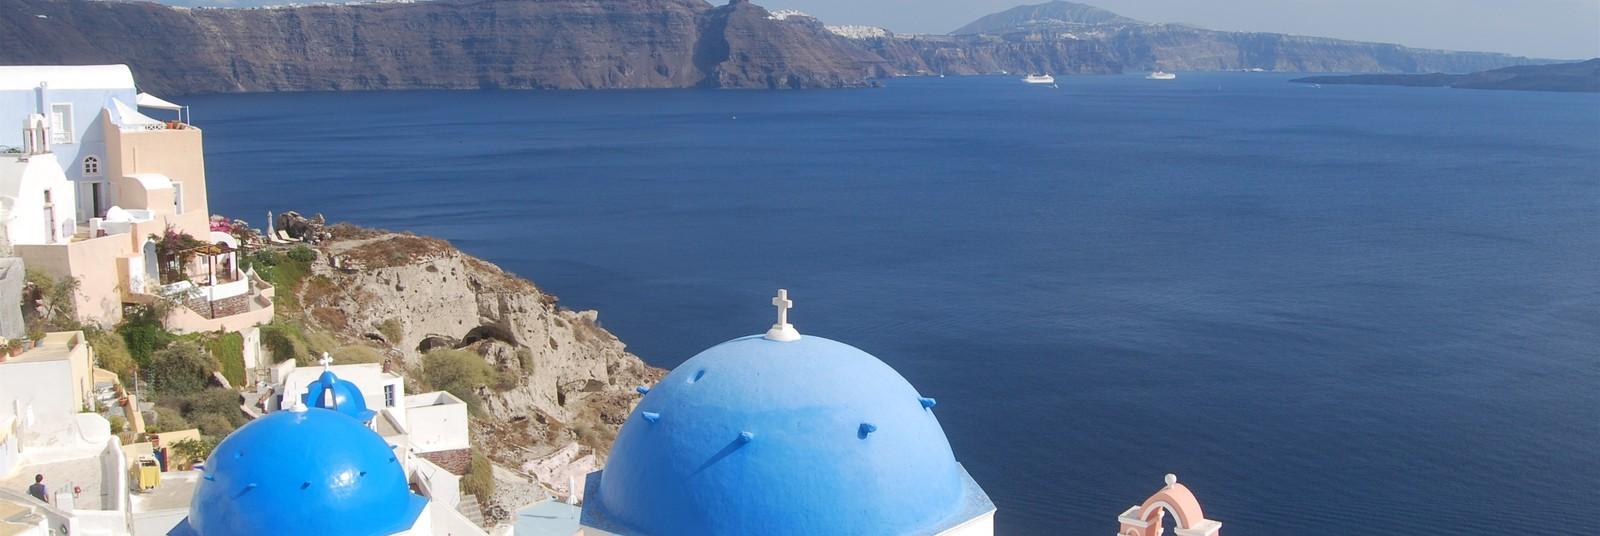 Homepage_large_santorini__greece